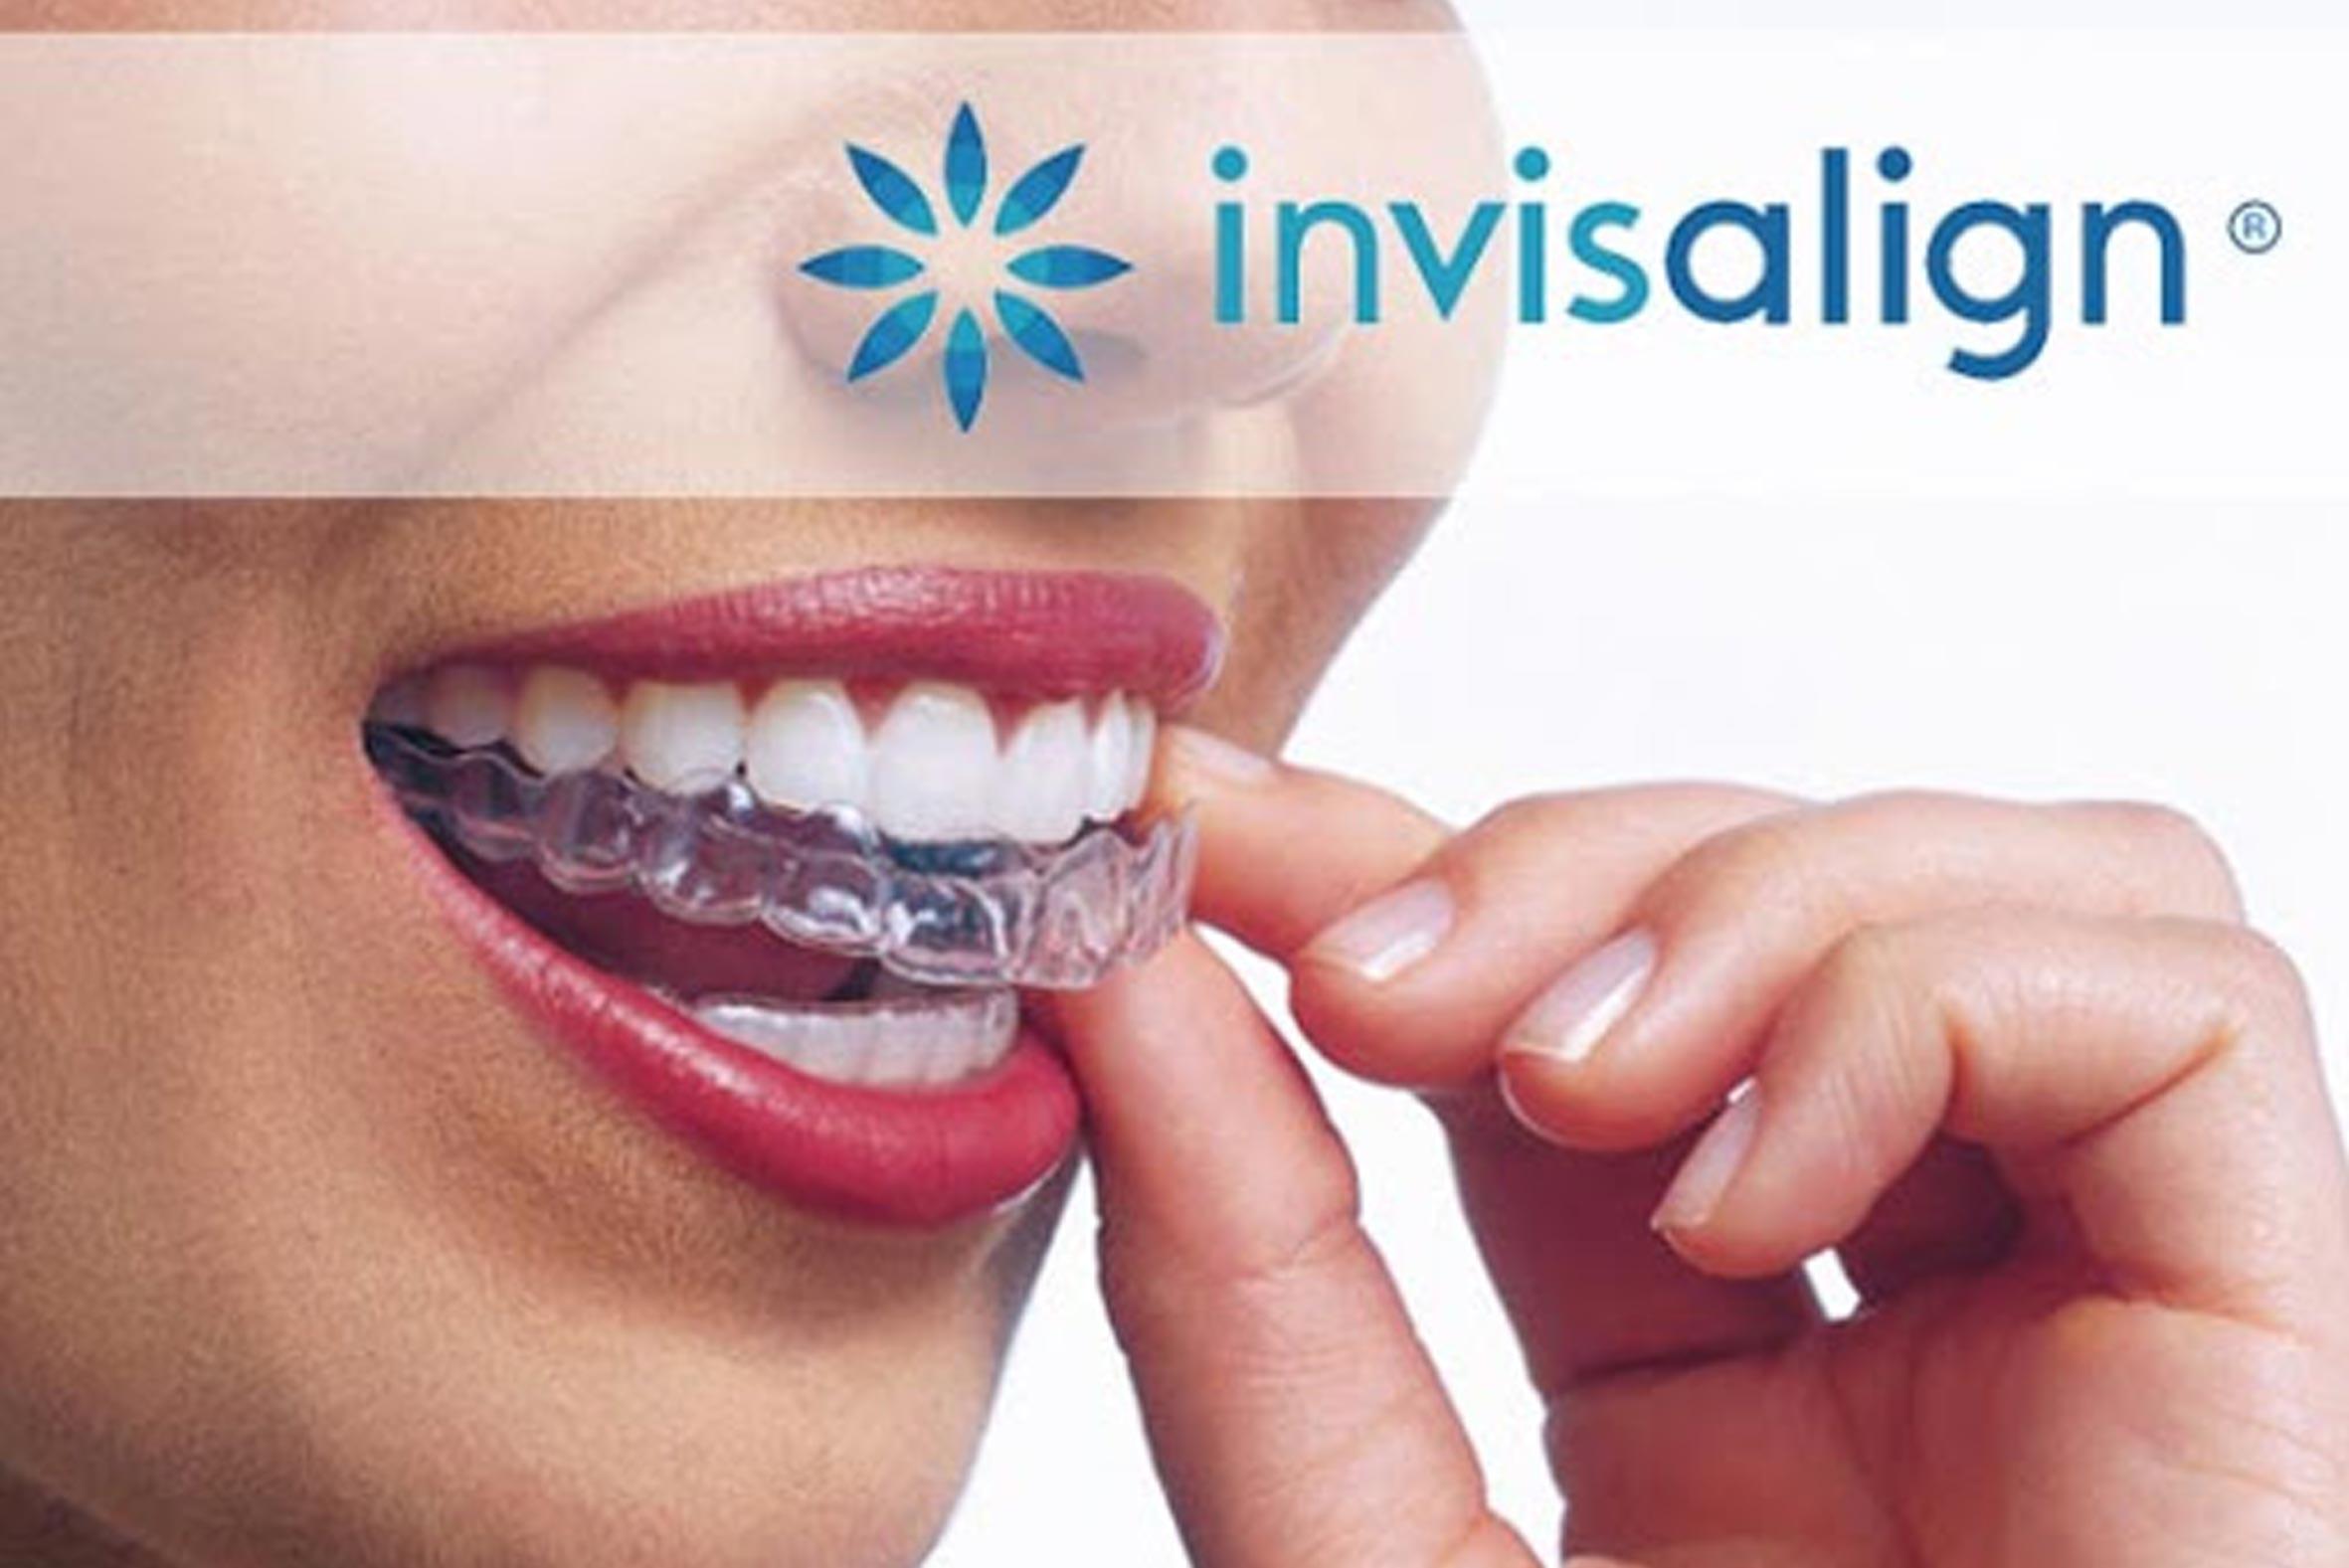 cabinet-orthodontie-villemagne-avignon-invisalign-9